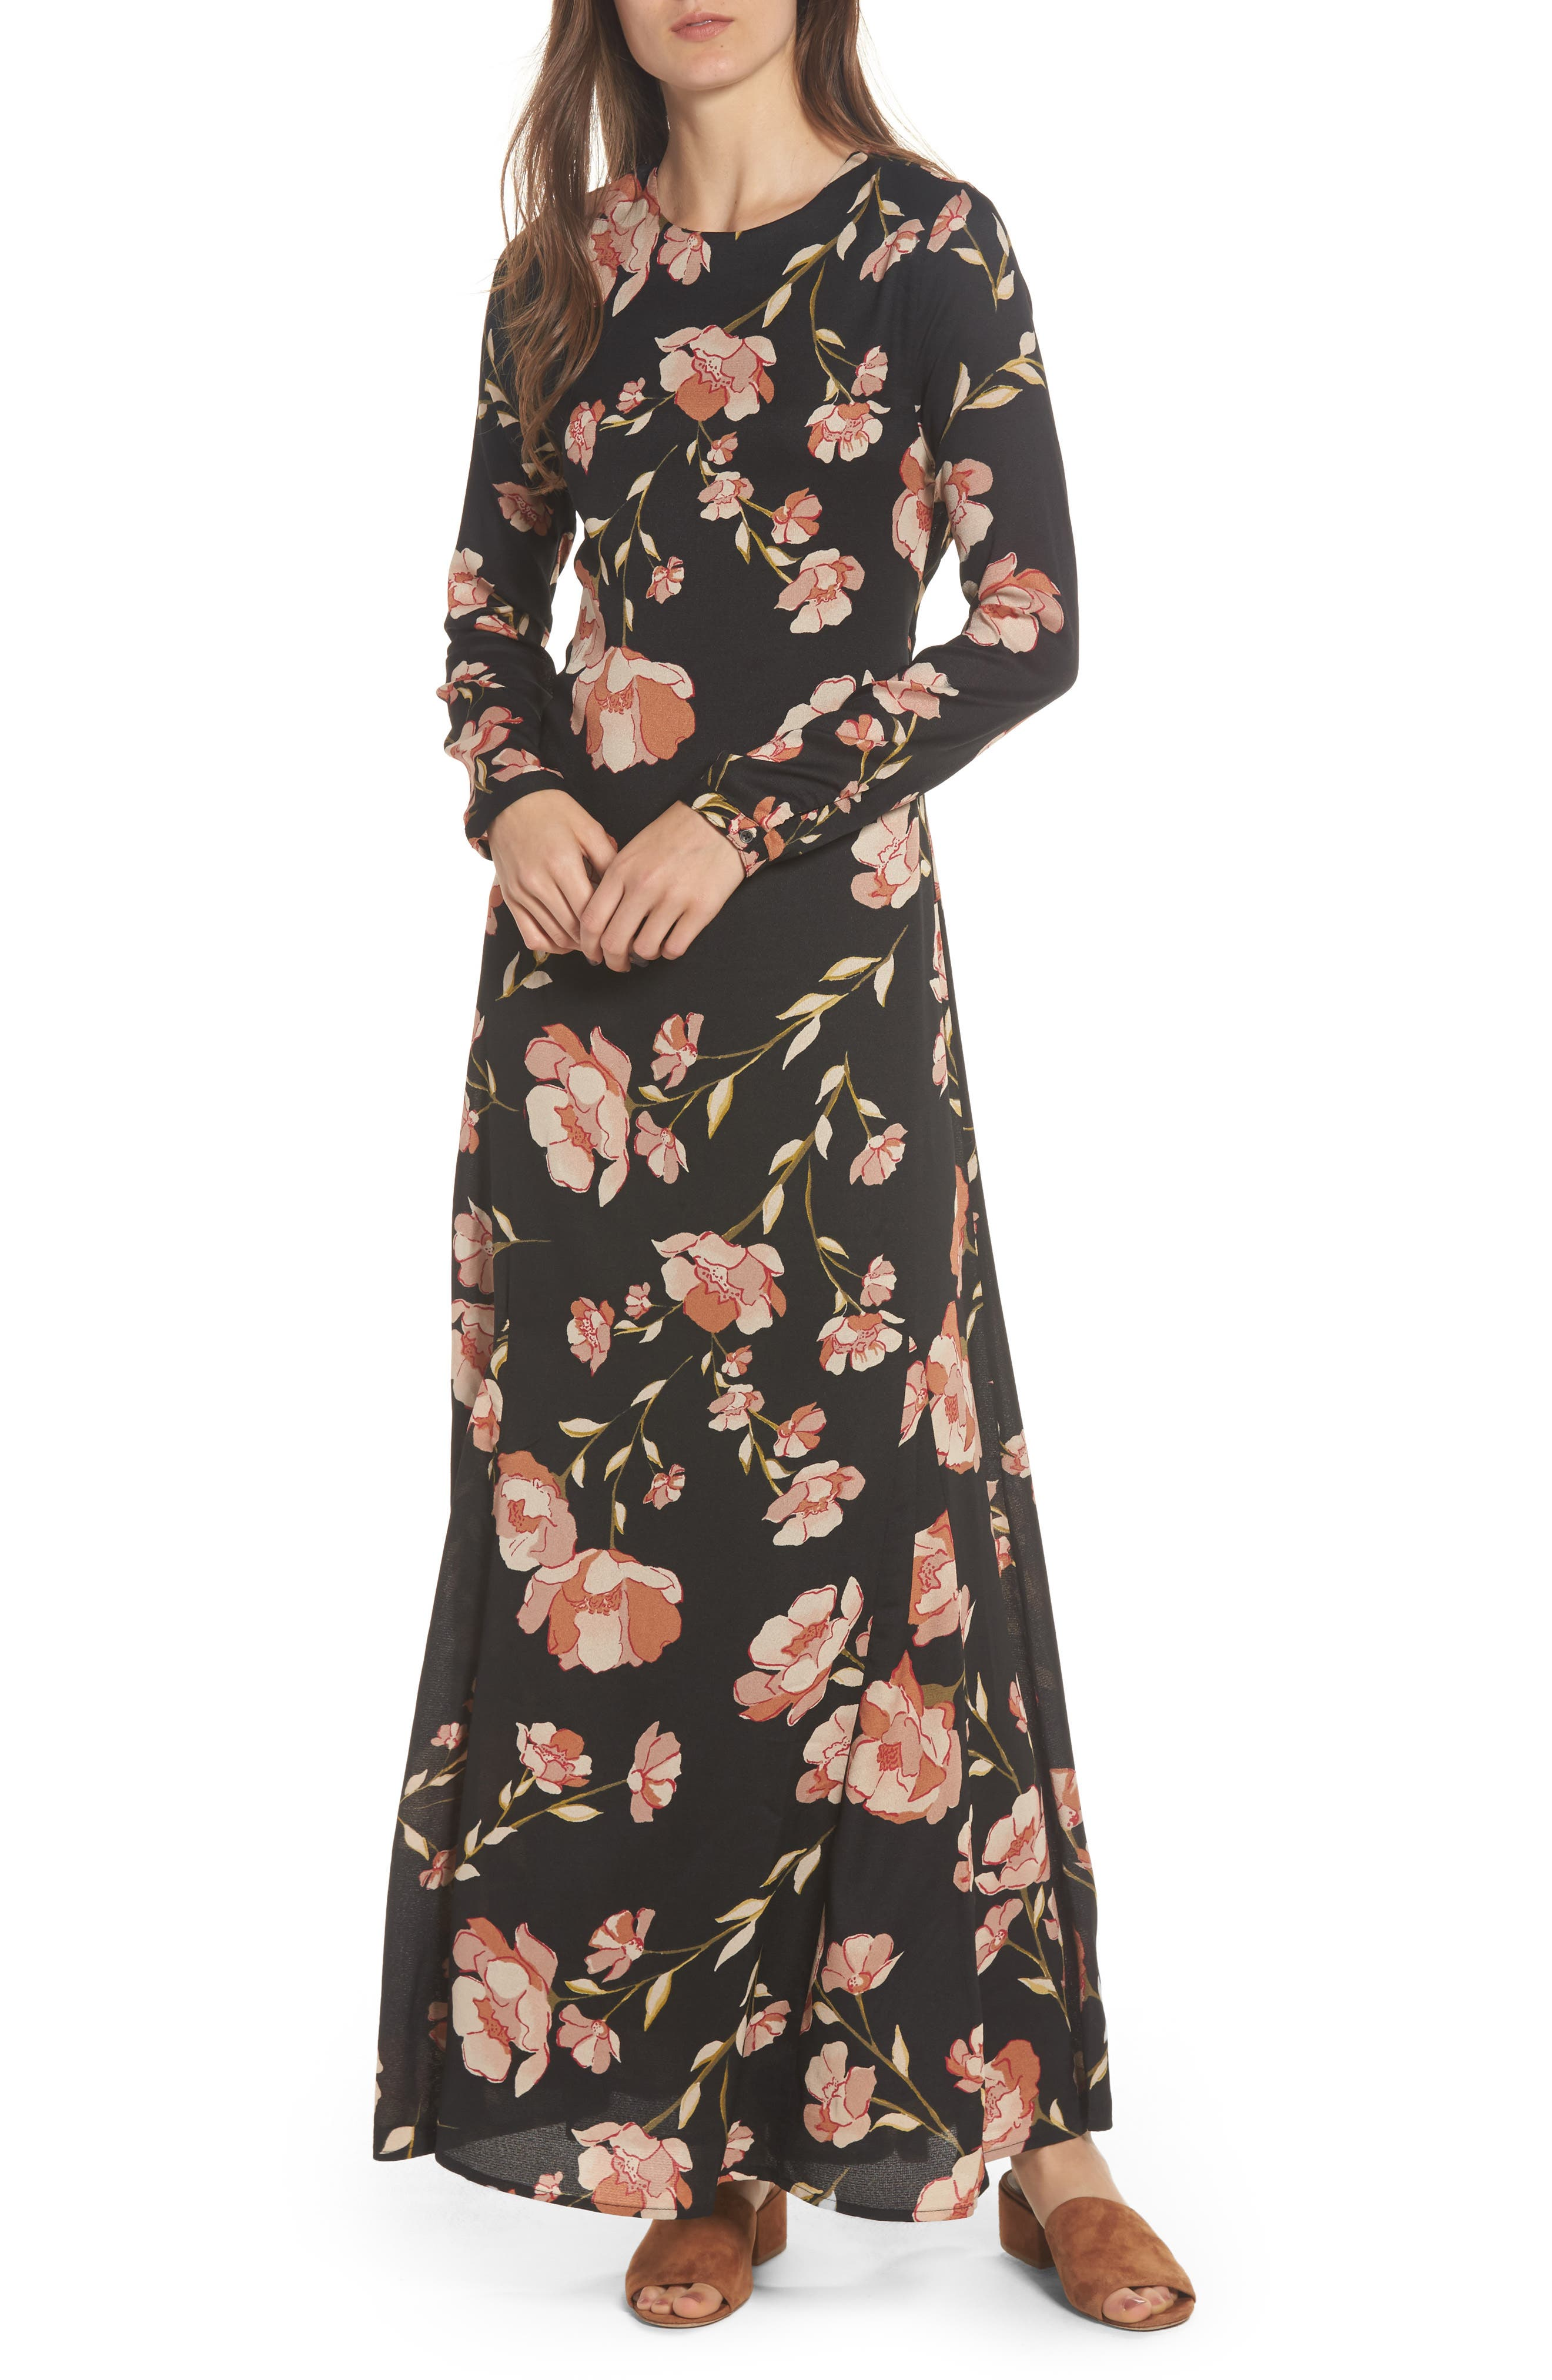 Floral Print Maxi Dress,                             Main thumbnail 1, color,                             001